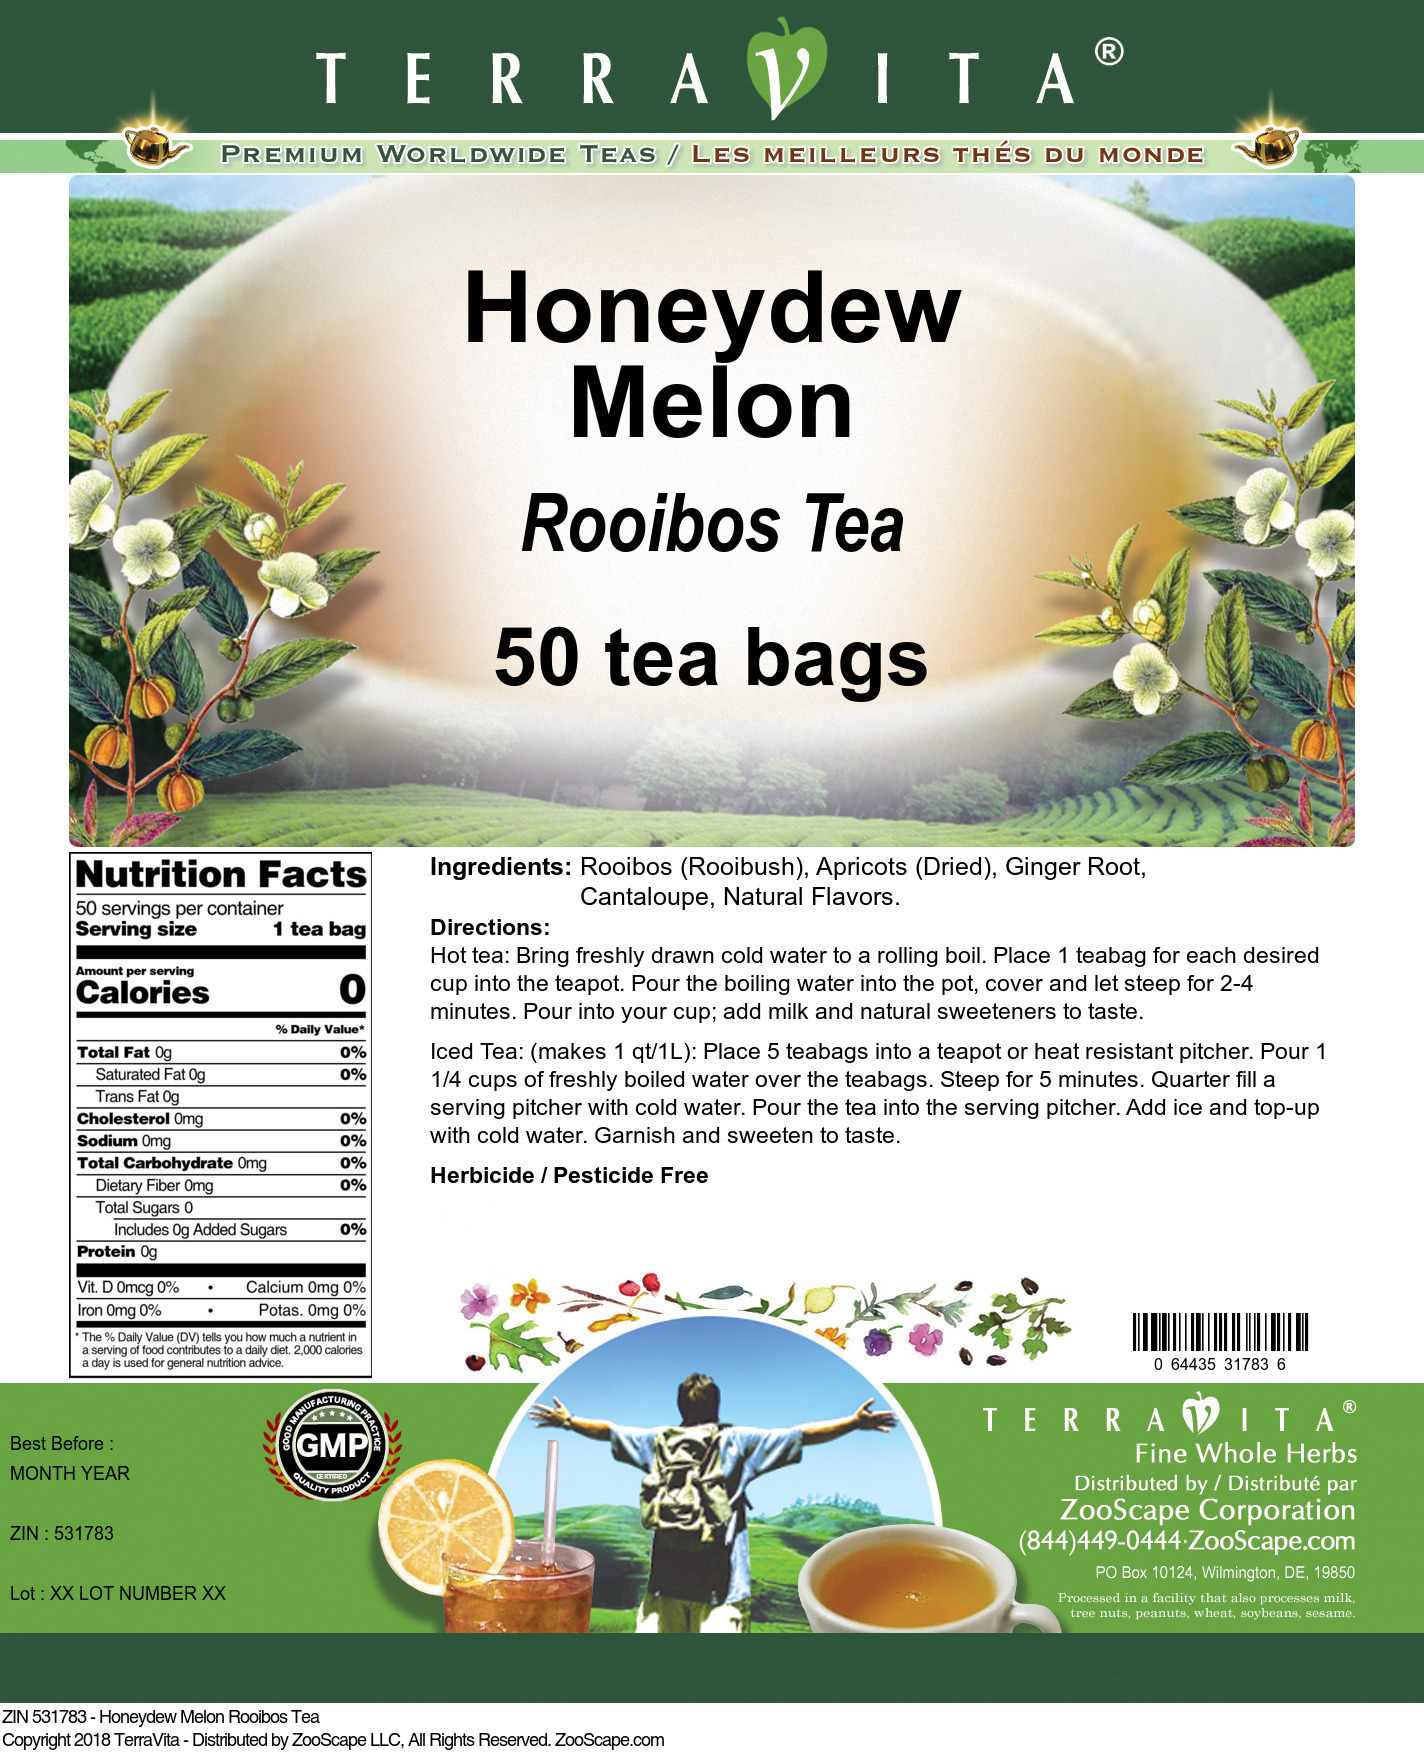 Honeydew Melon Rooibos Tea